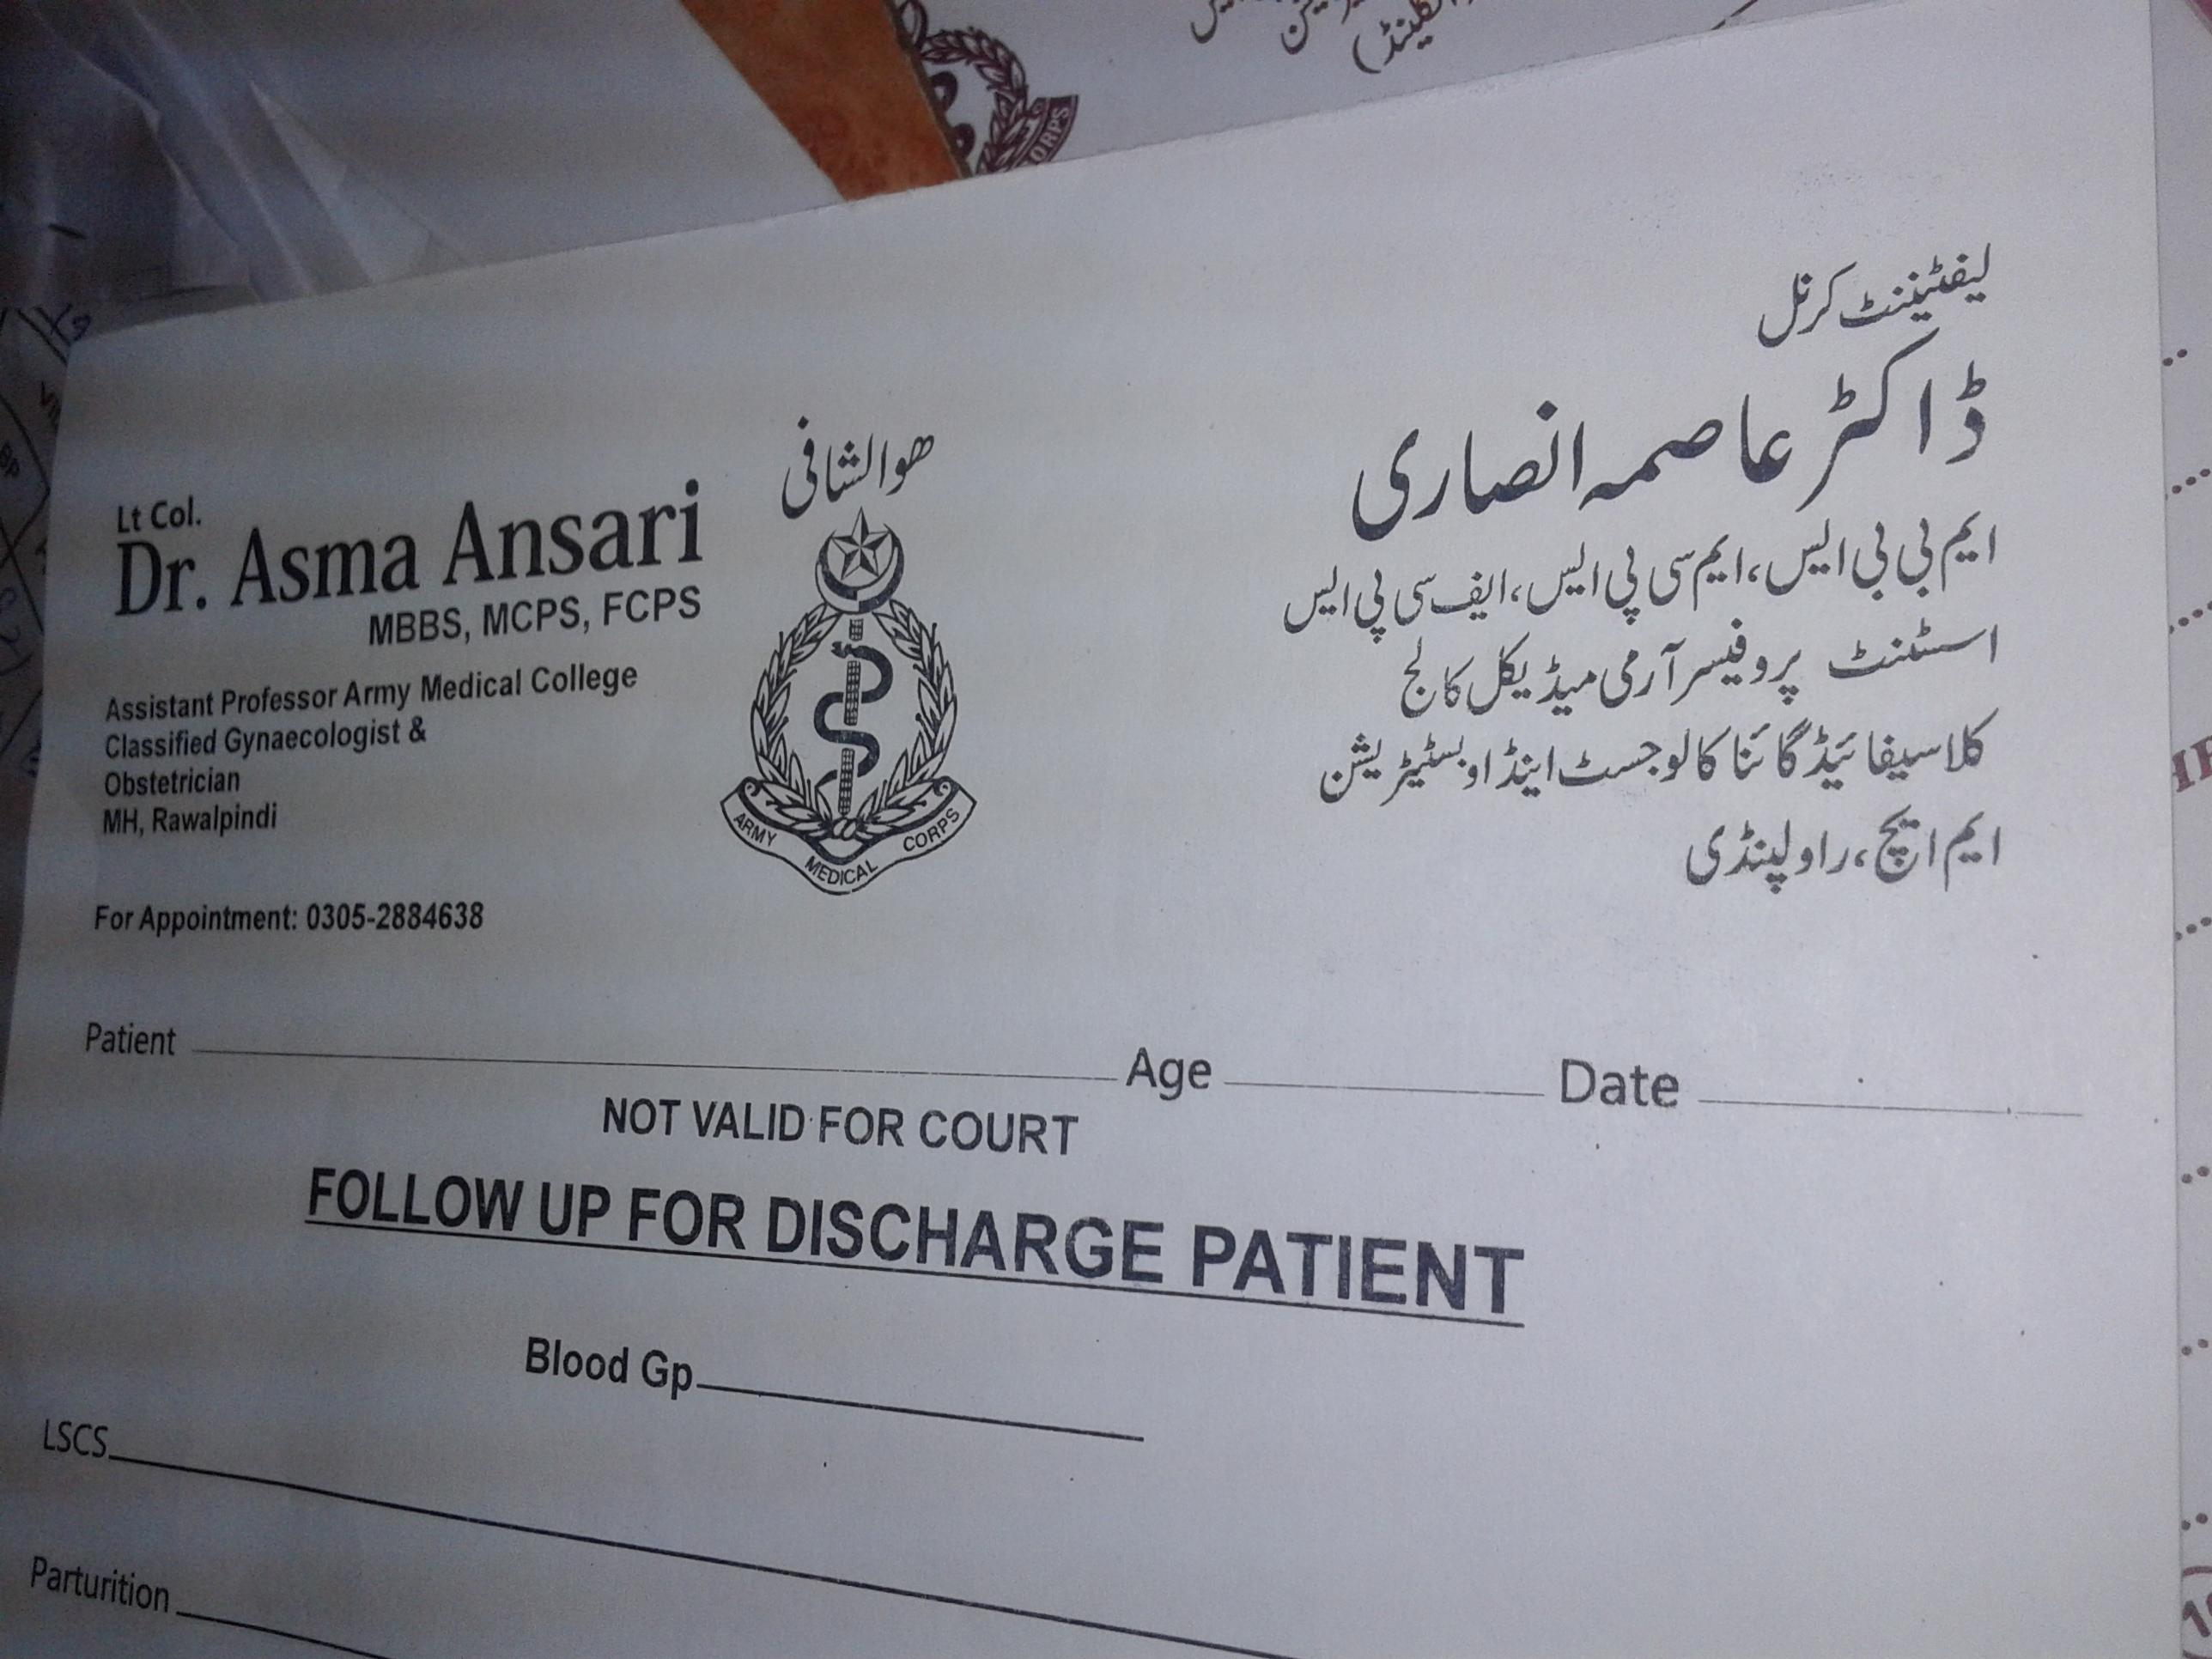 Dr  Lt col Asma Ansari - Gynecologist in Rawalpindi